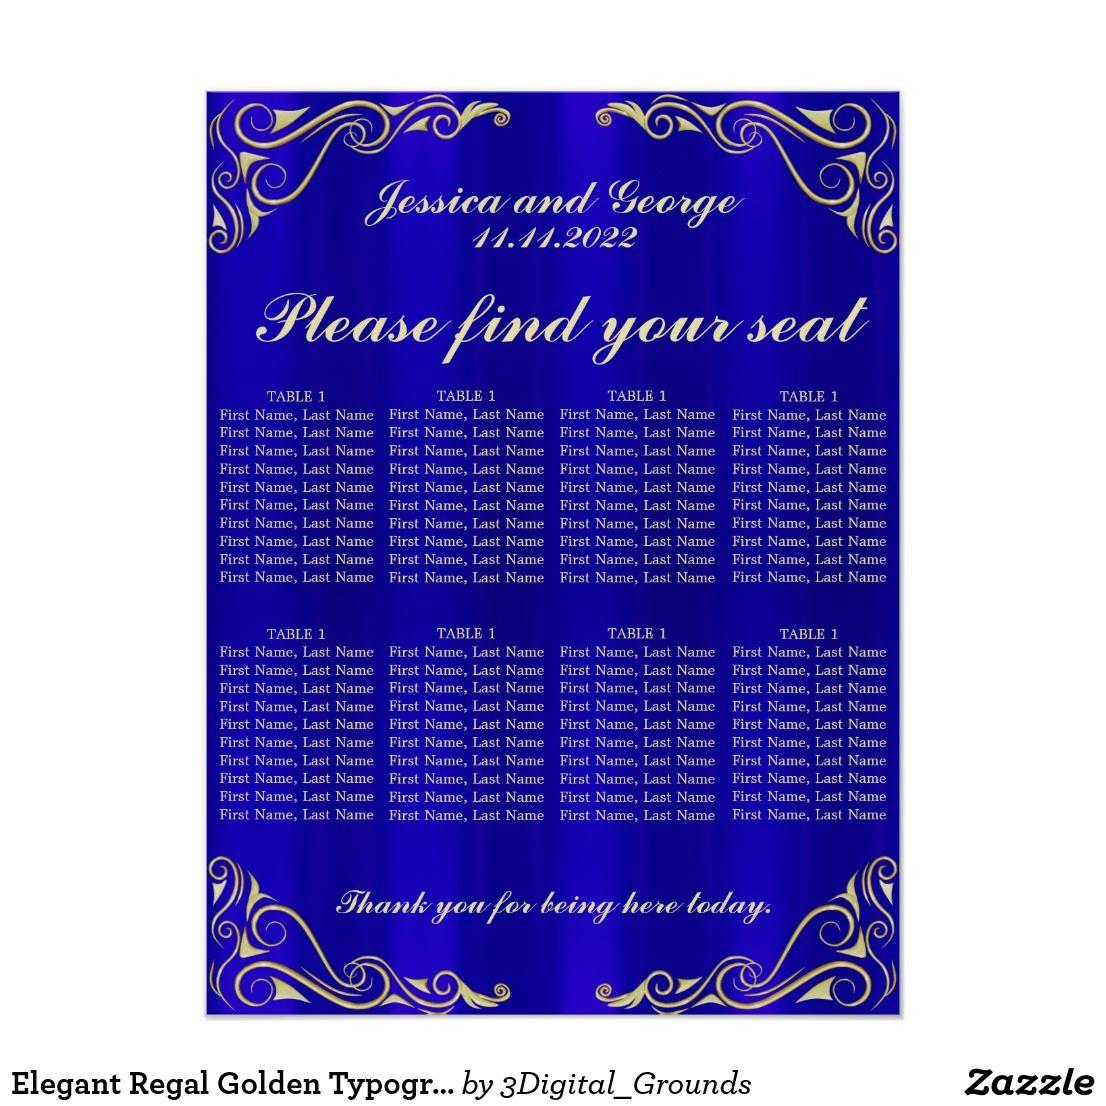 Elegant Regal Golden Typography Seating Chart Zazzle Com Seating Chart Wedding Seating Charts Custom Decor